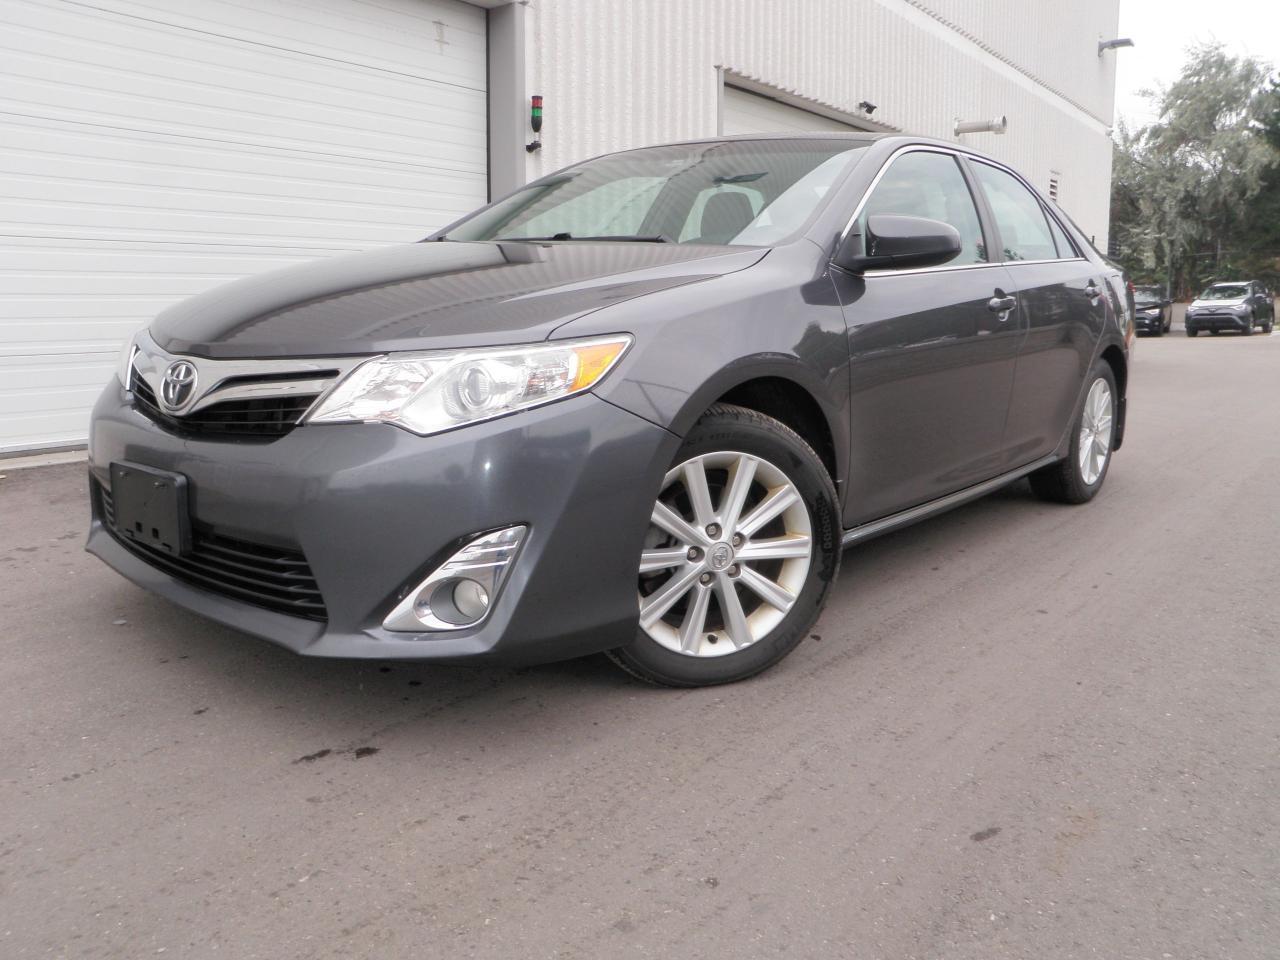 Photo of Grey 2013 Toyota Camry